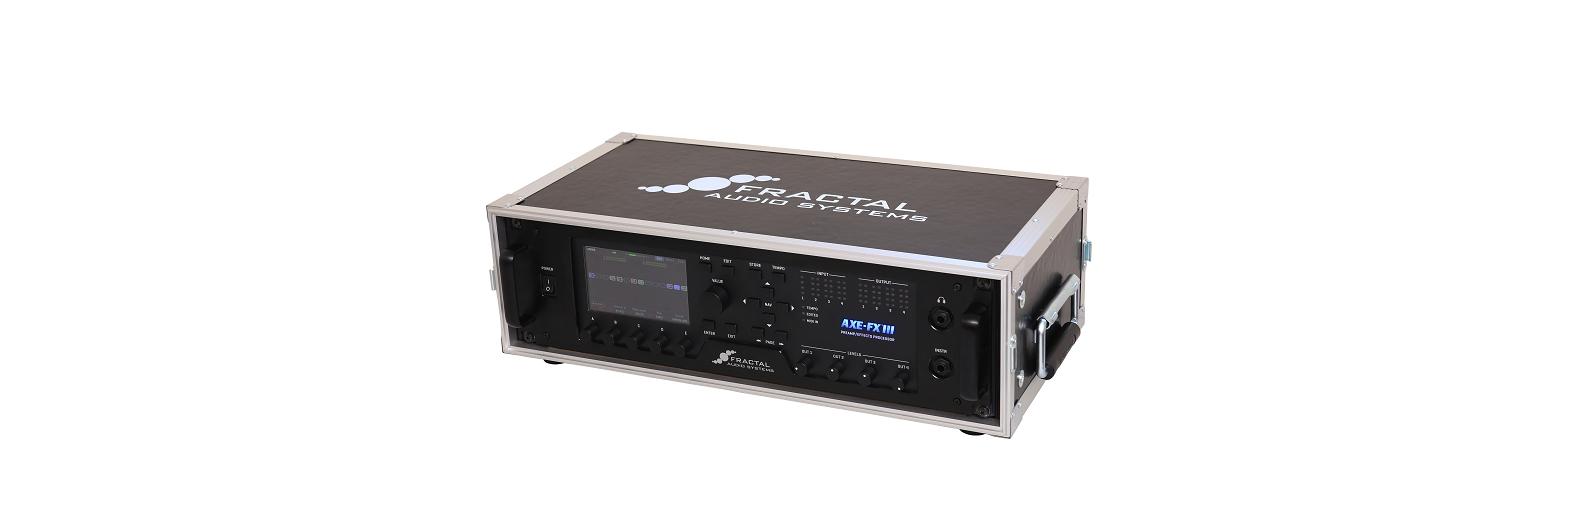 fractal audio systems okada international